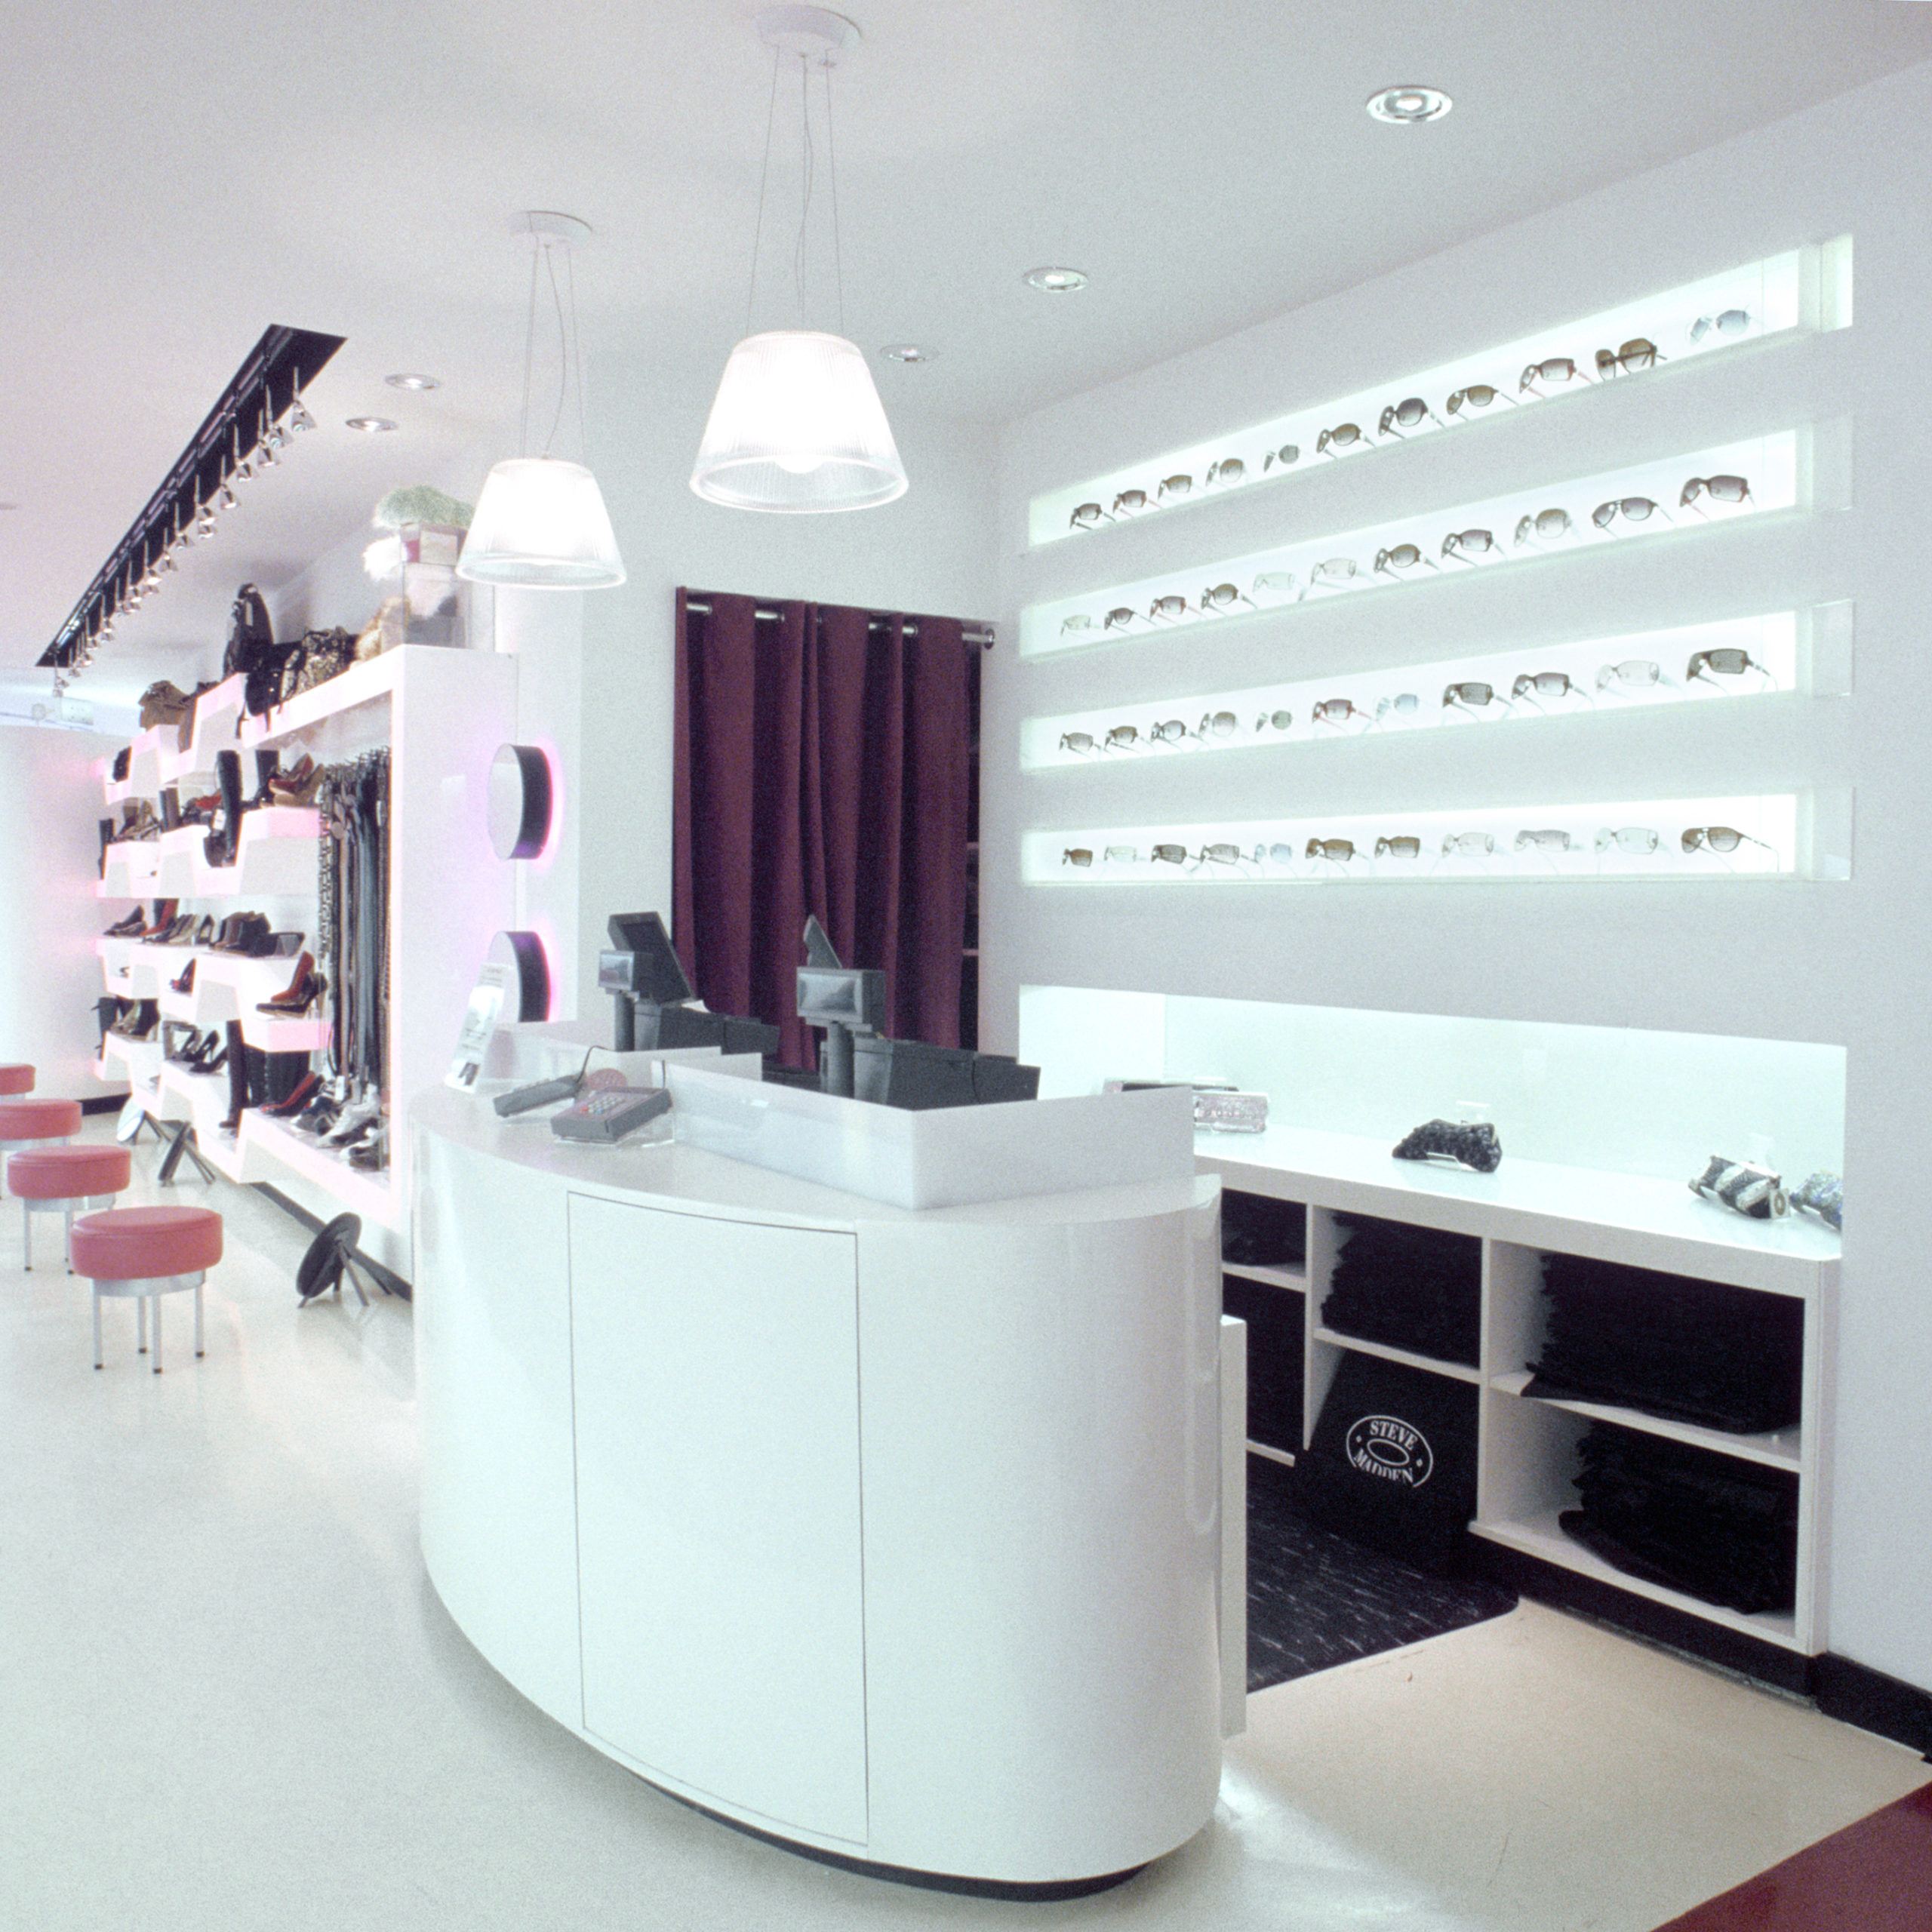 Retail store architects, New York City